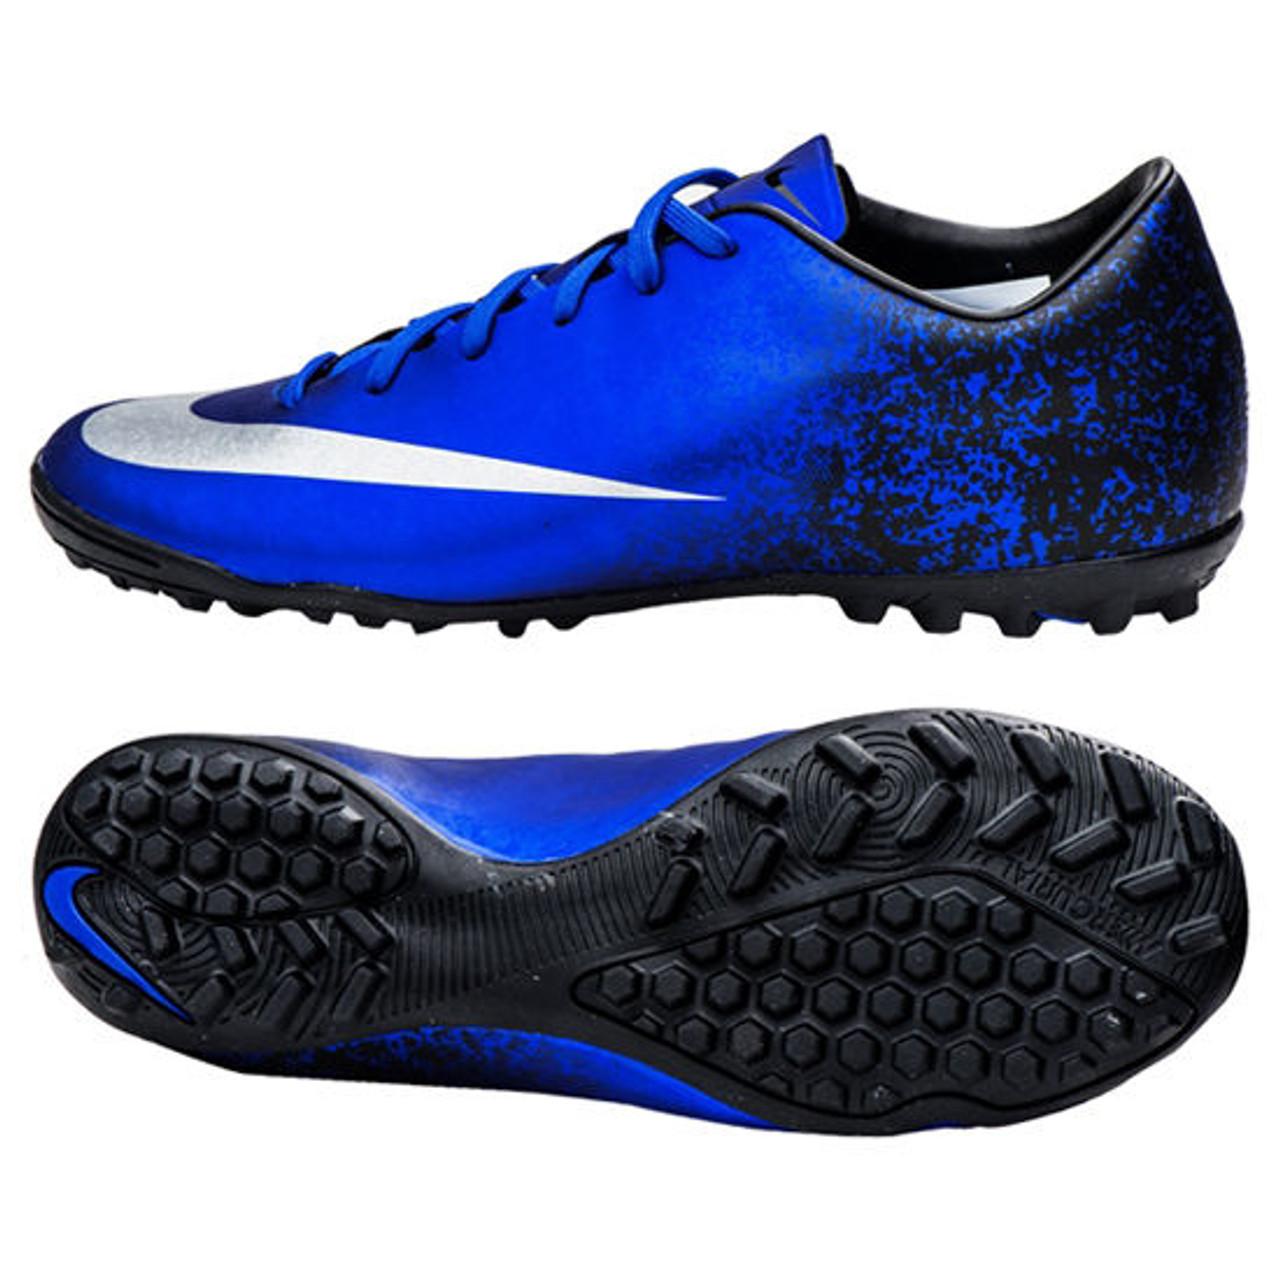 3510441c8ded NIKE MERCURIAL VICTORY V CR TF Deep Royal Blue - Soccer Plus